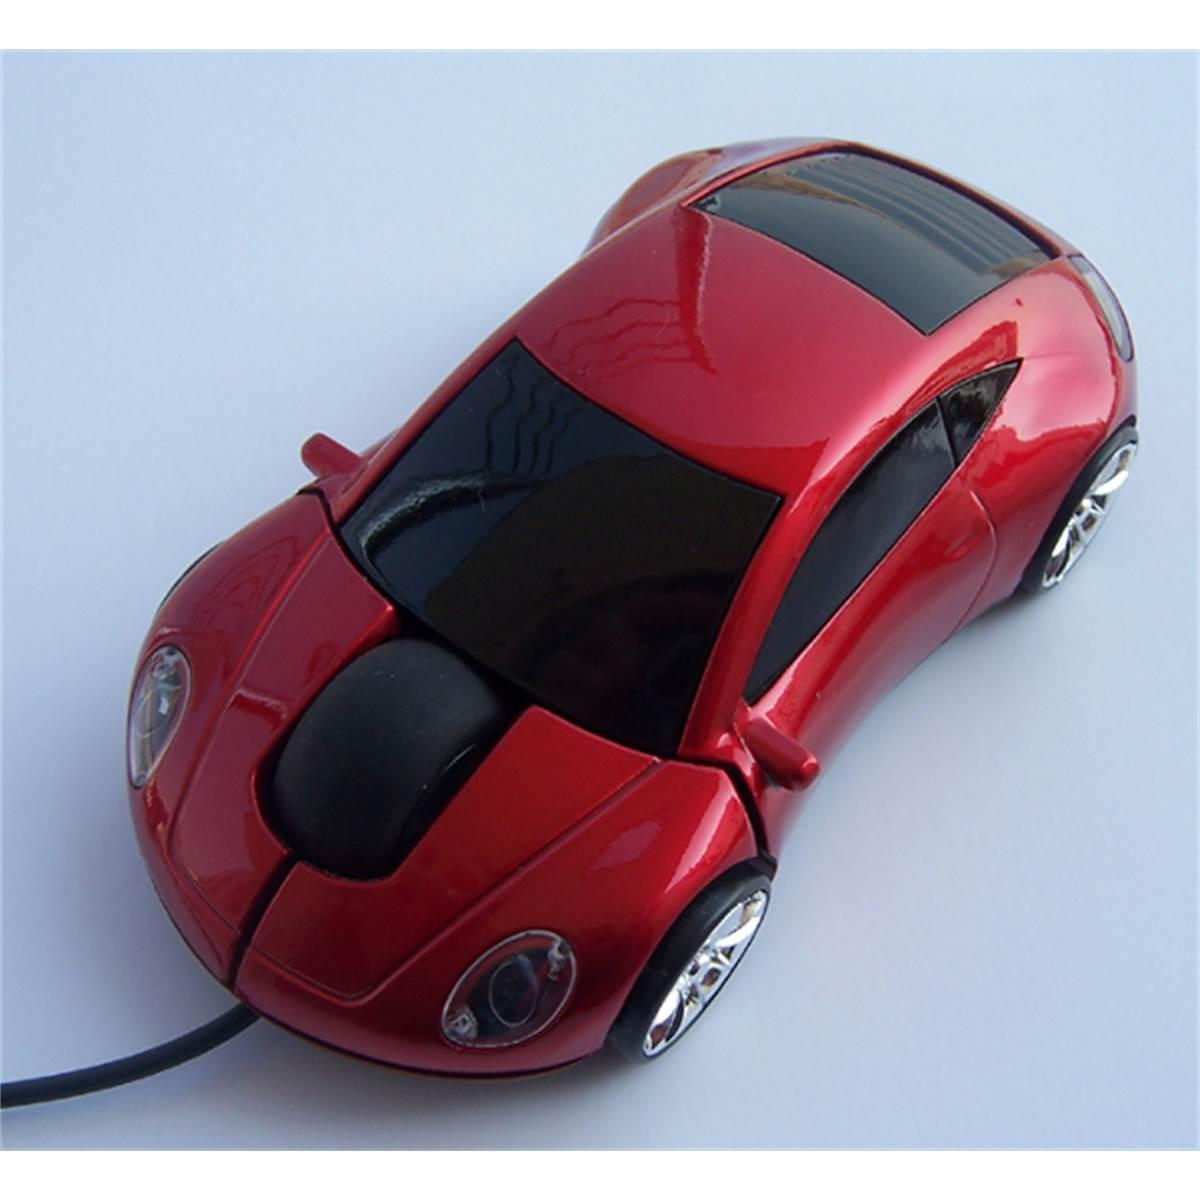 Souris optique filaire USB voiture rouge RD Innovation